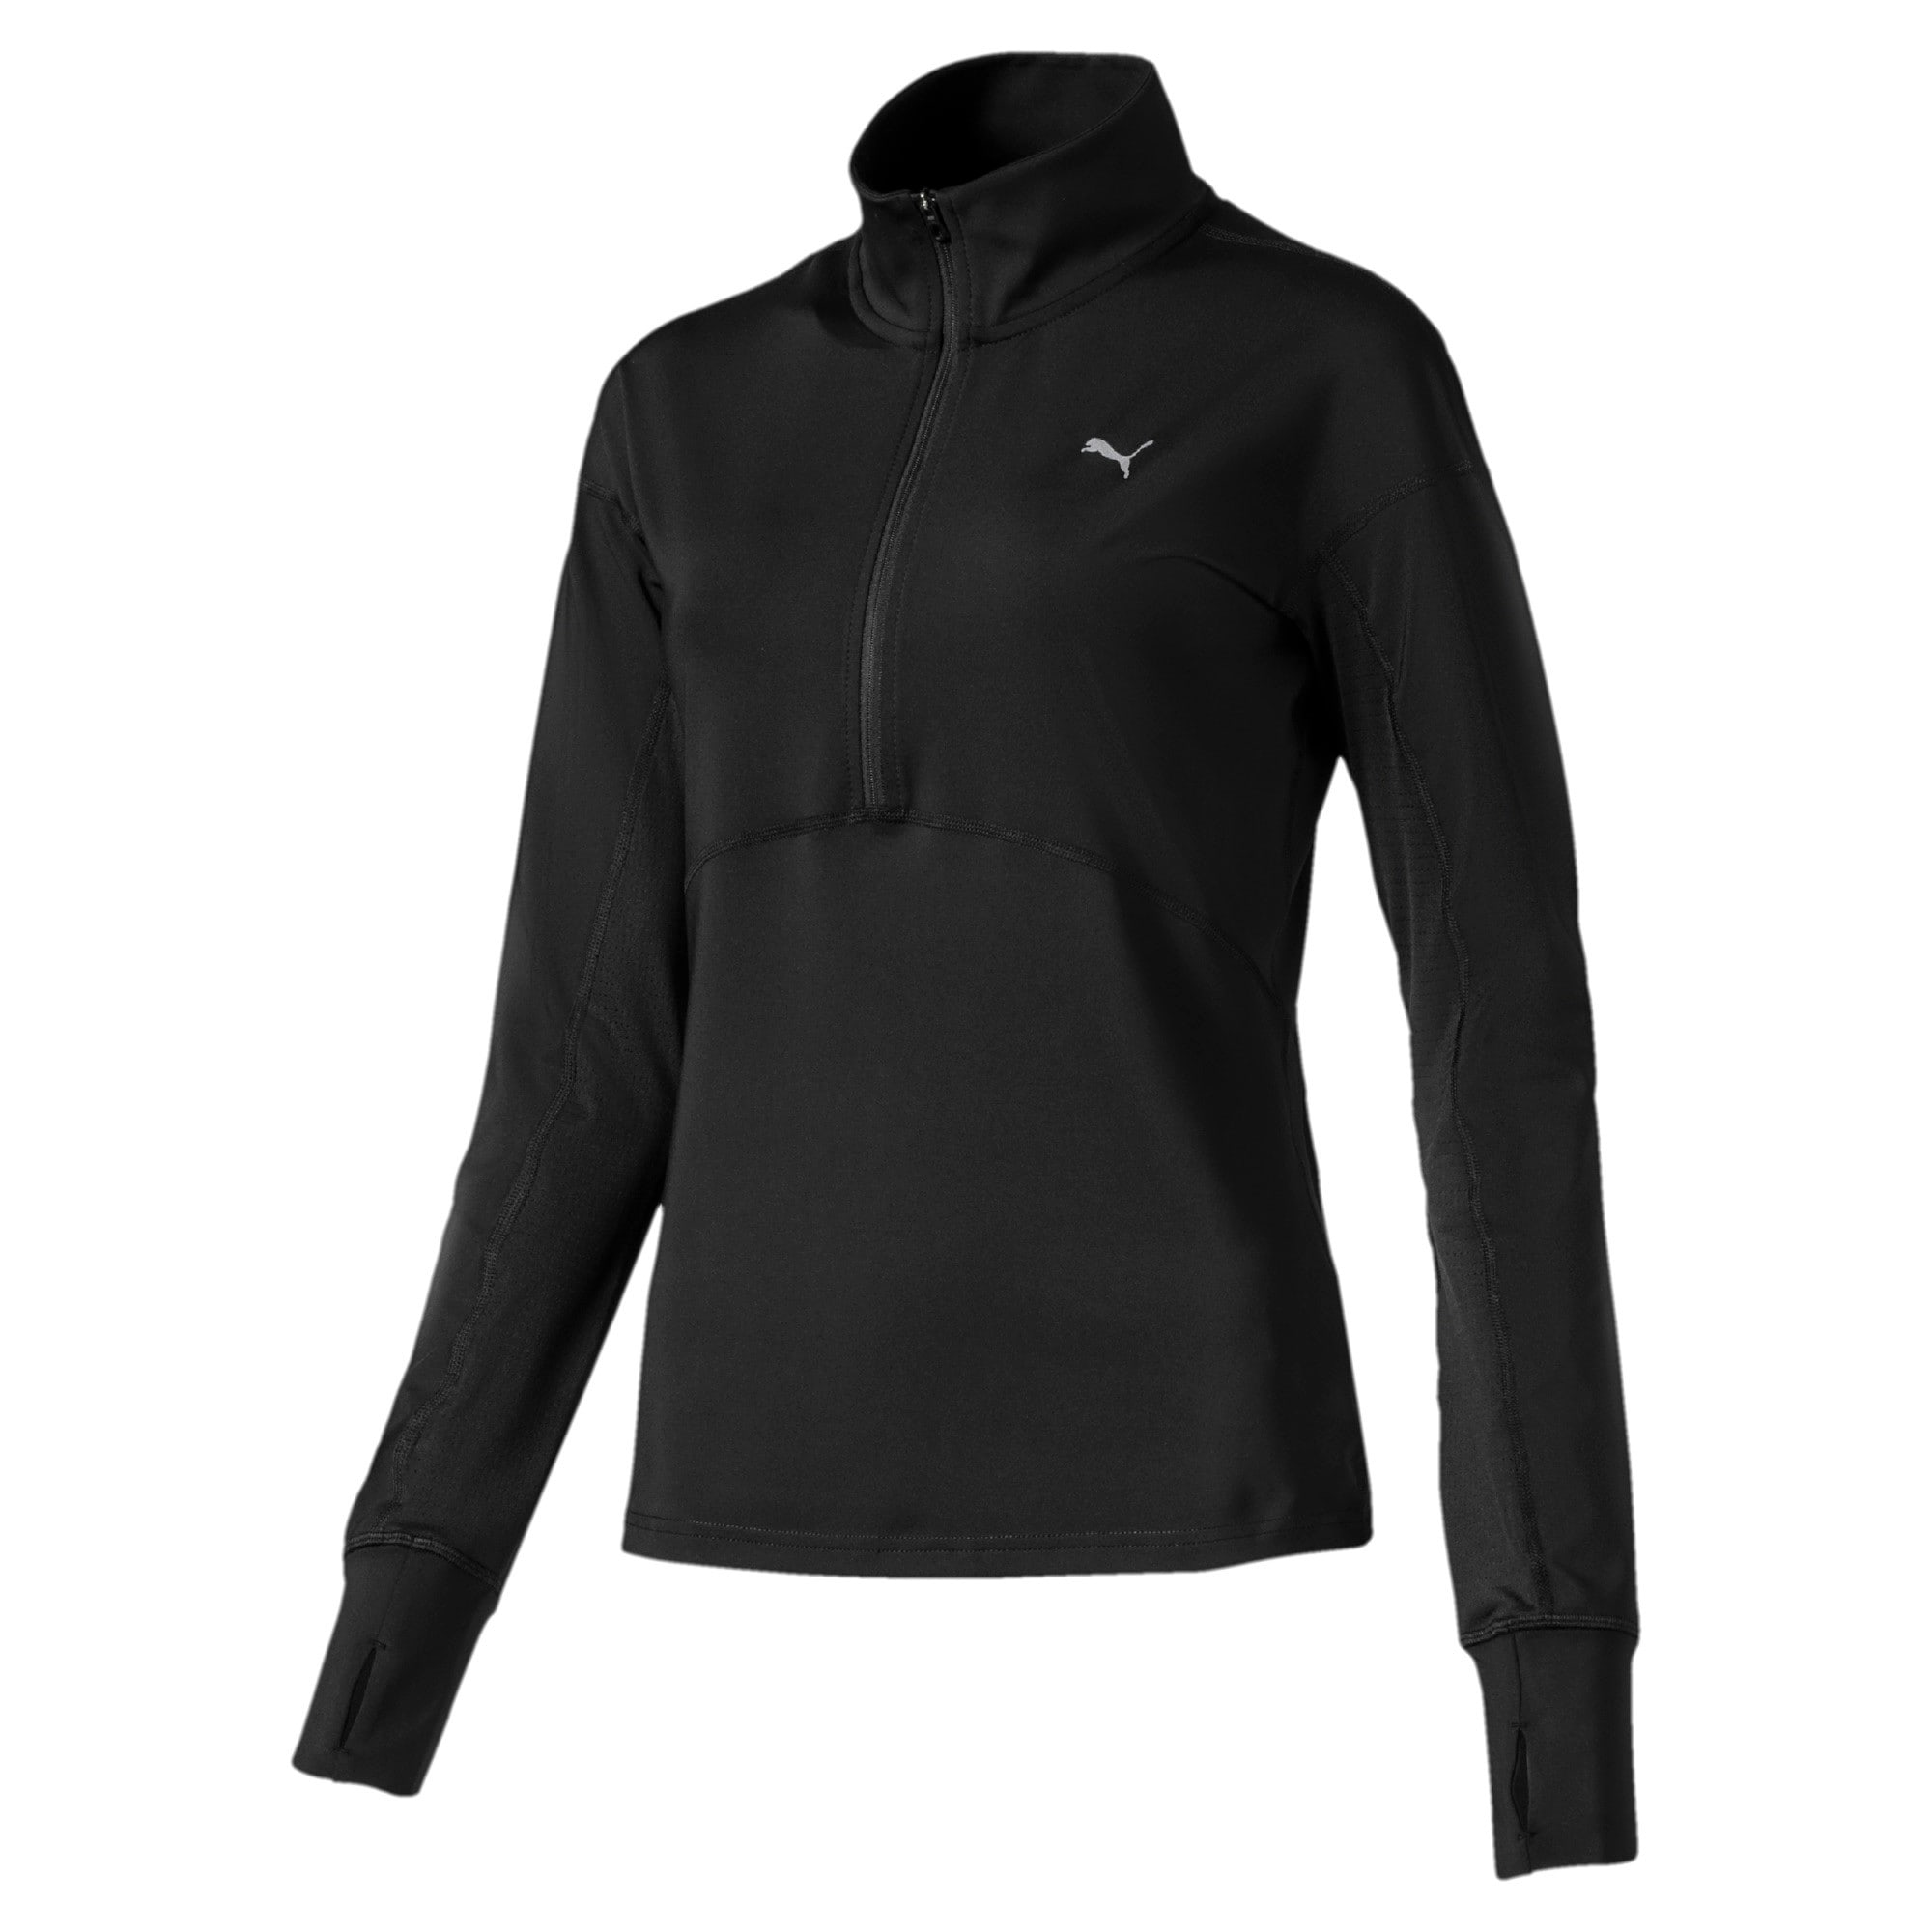 Thumbnail 4 of Ignite Long Sleeve Women's Running Pullover, Puma Black, medium